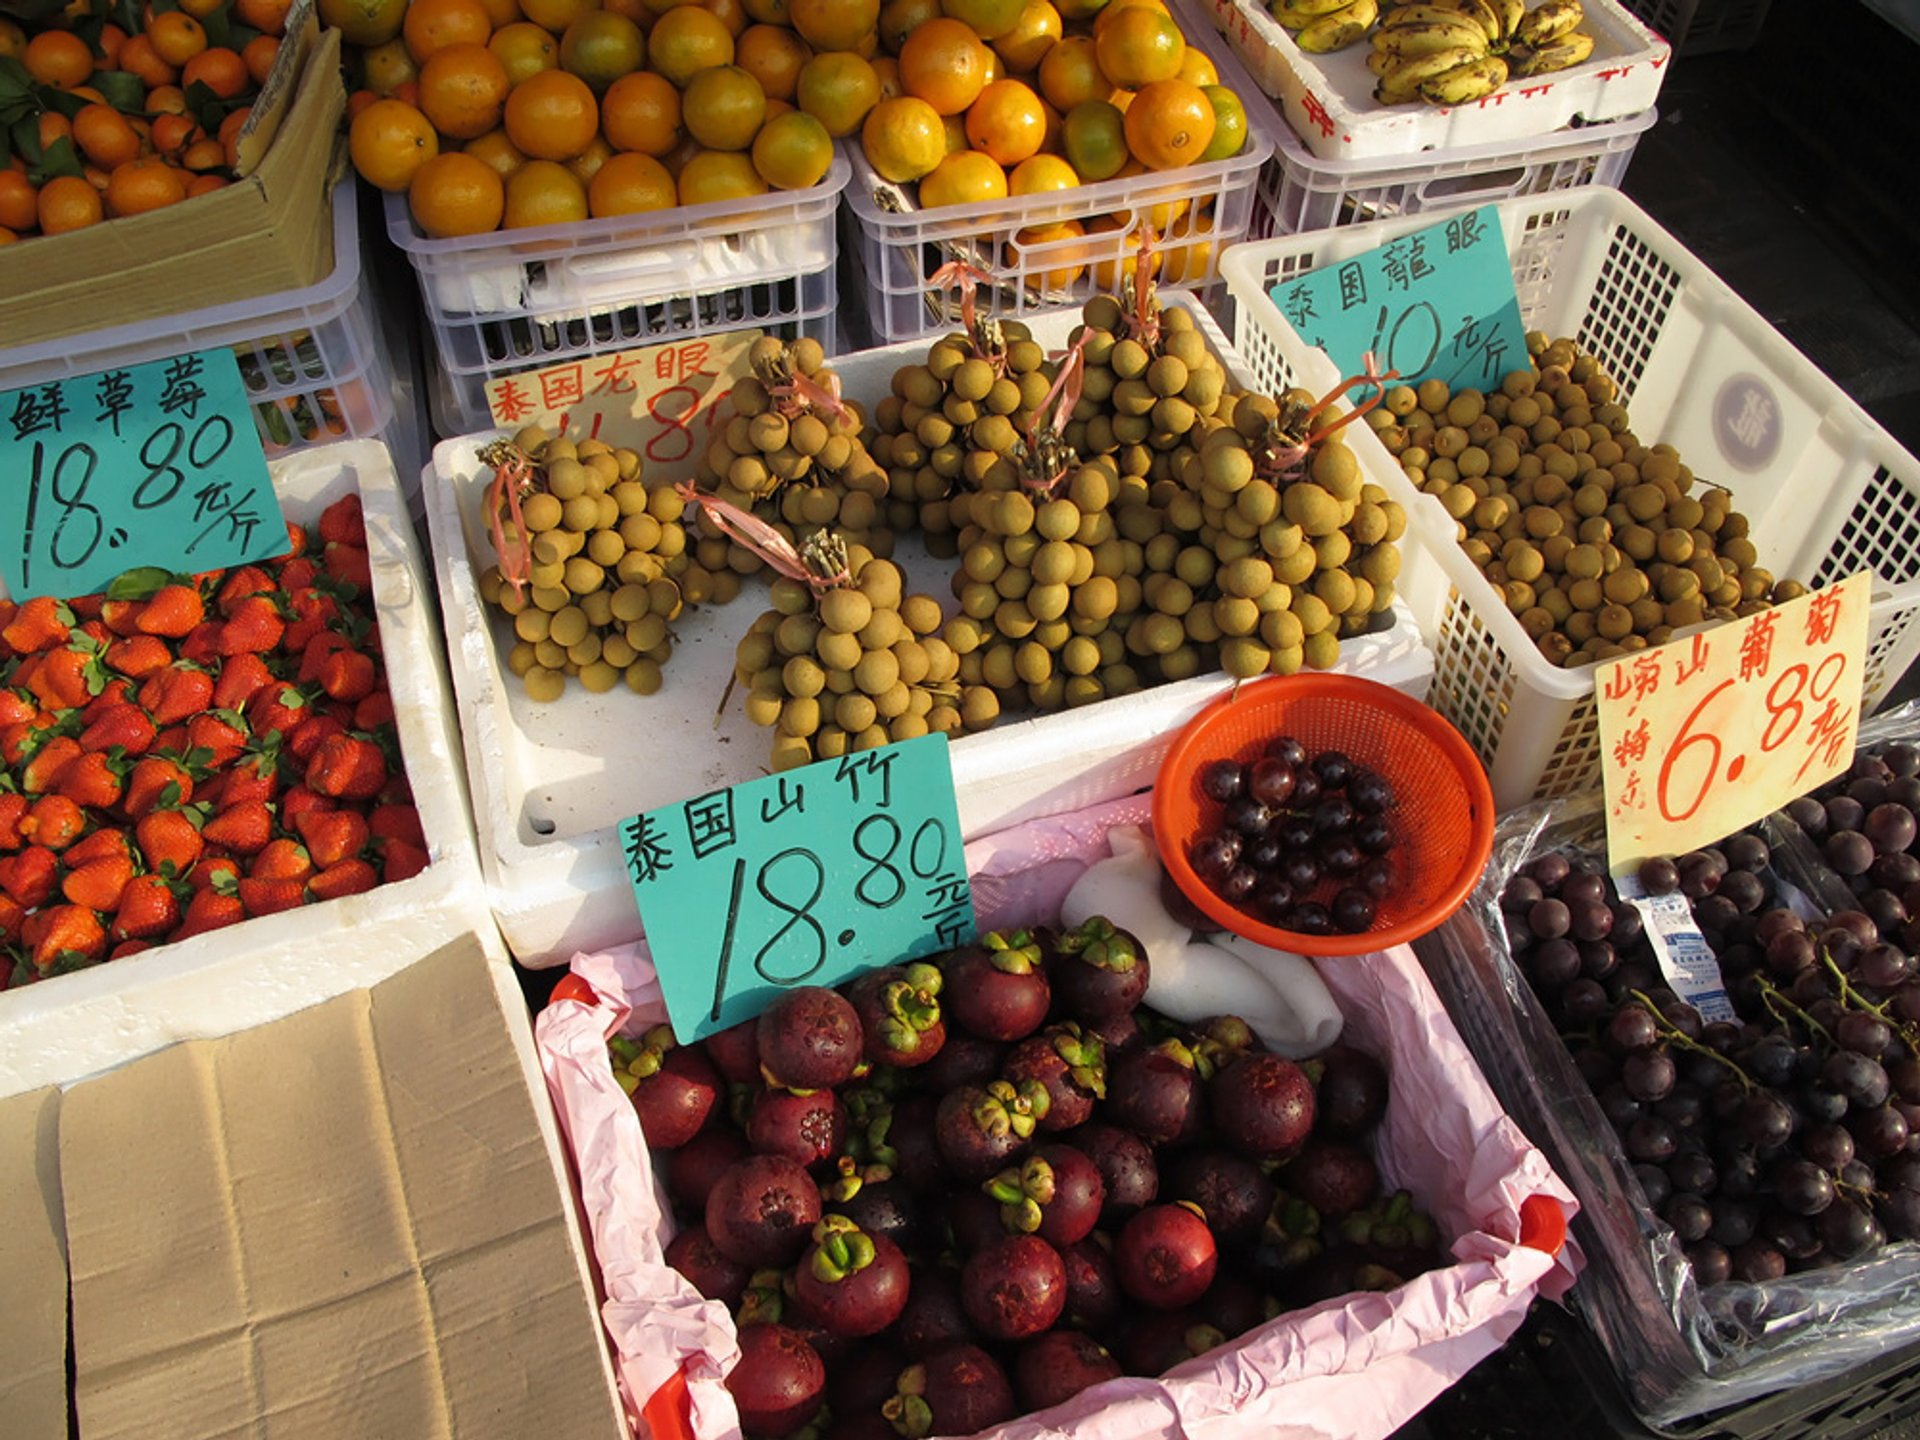 Summer Fruits Season in Shanghai 2019 - Best Time